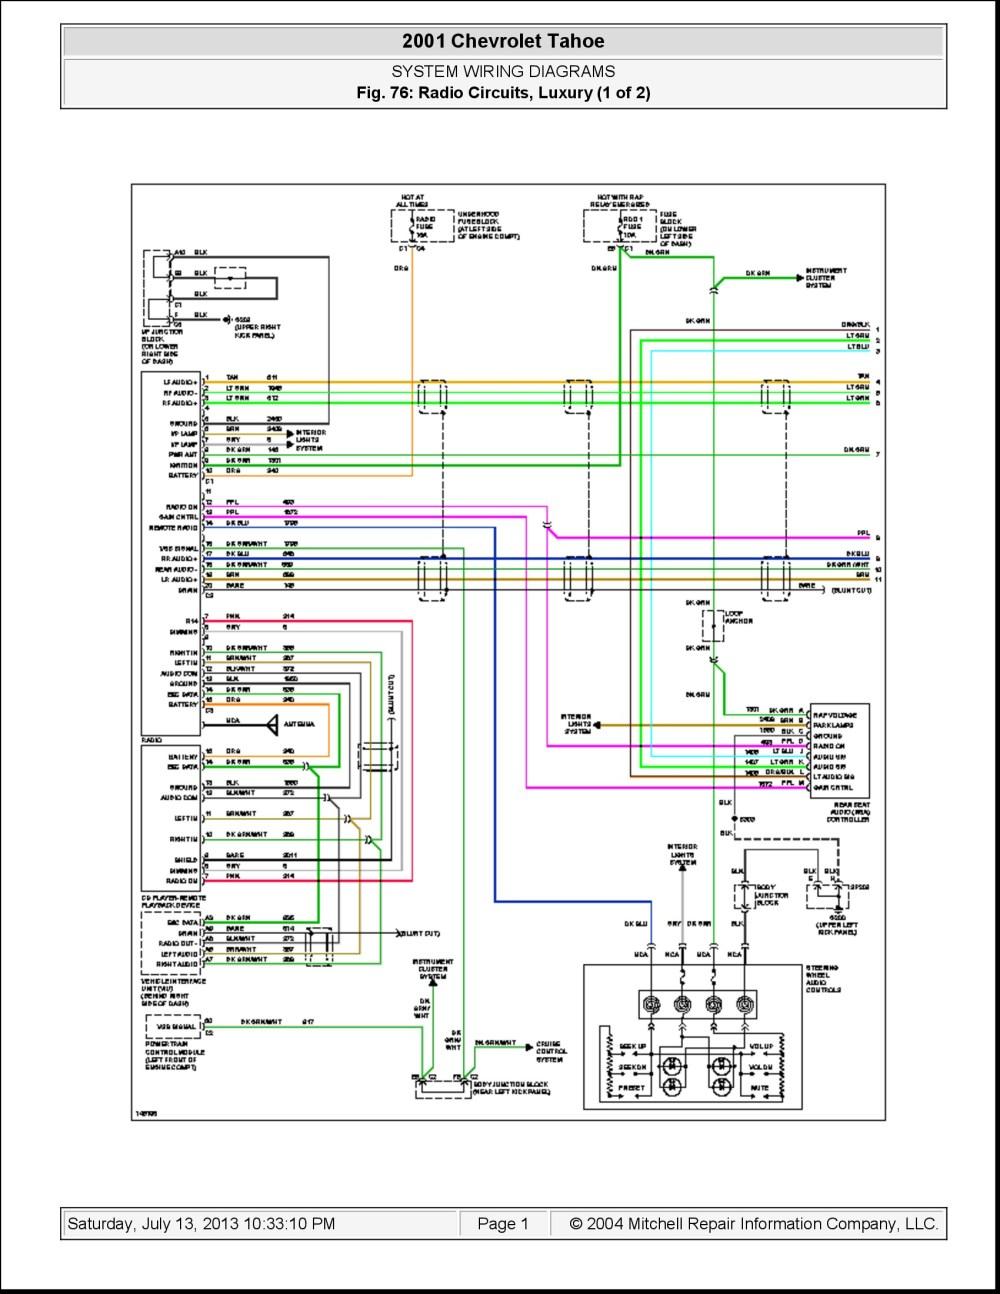 medium resolution of 98 camry cd player wiring diagram electrical work wiring diagram u2022 rh aglabs co 2001 toyota